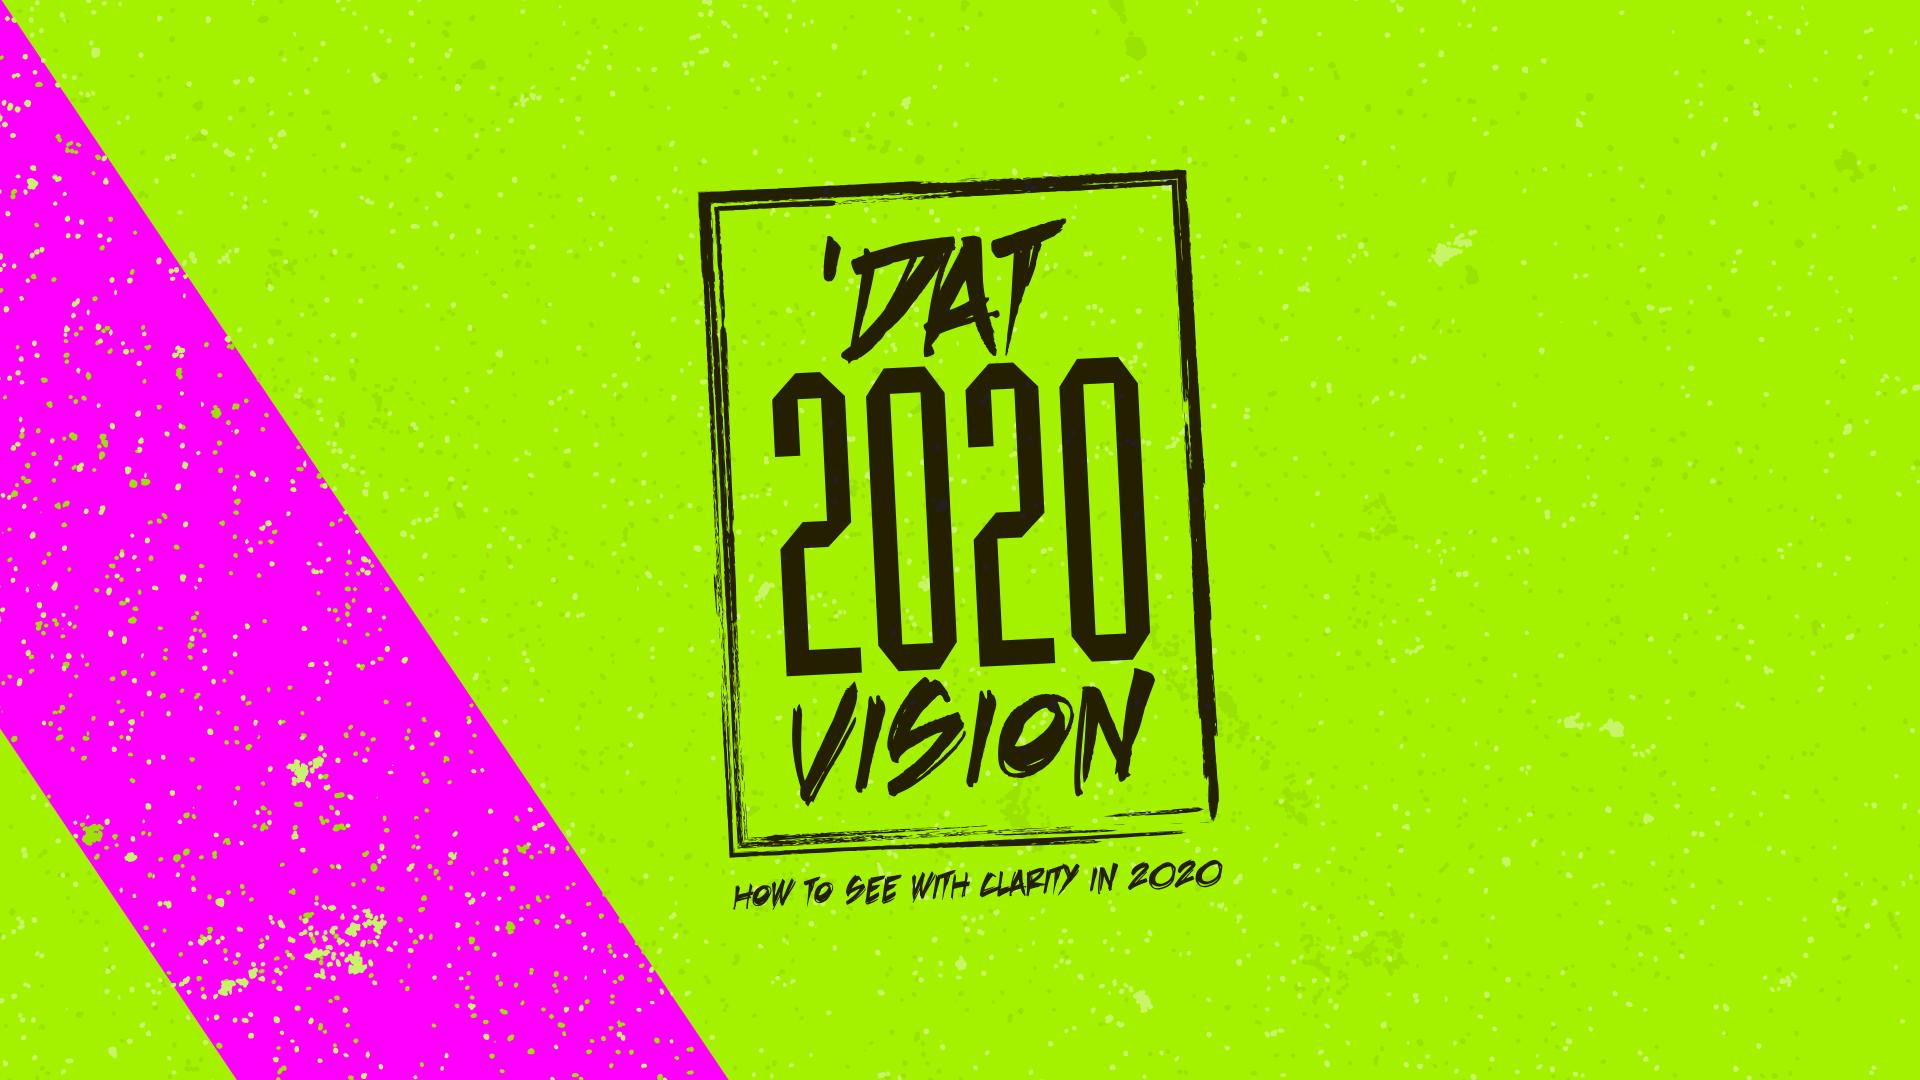 Dat 2020 Vision